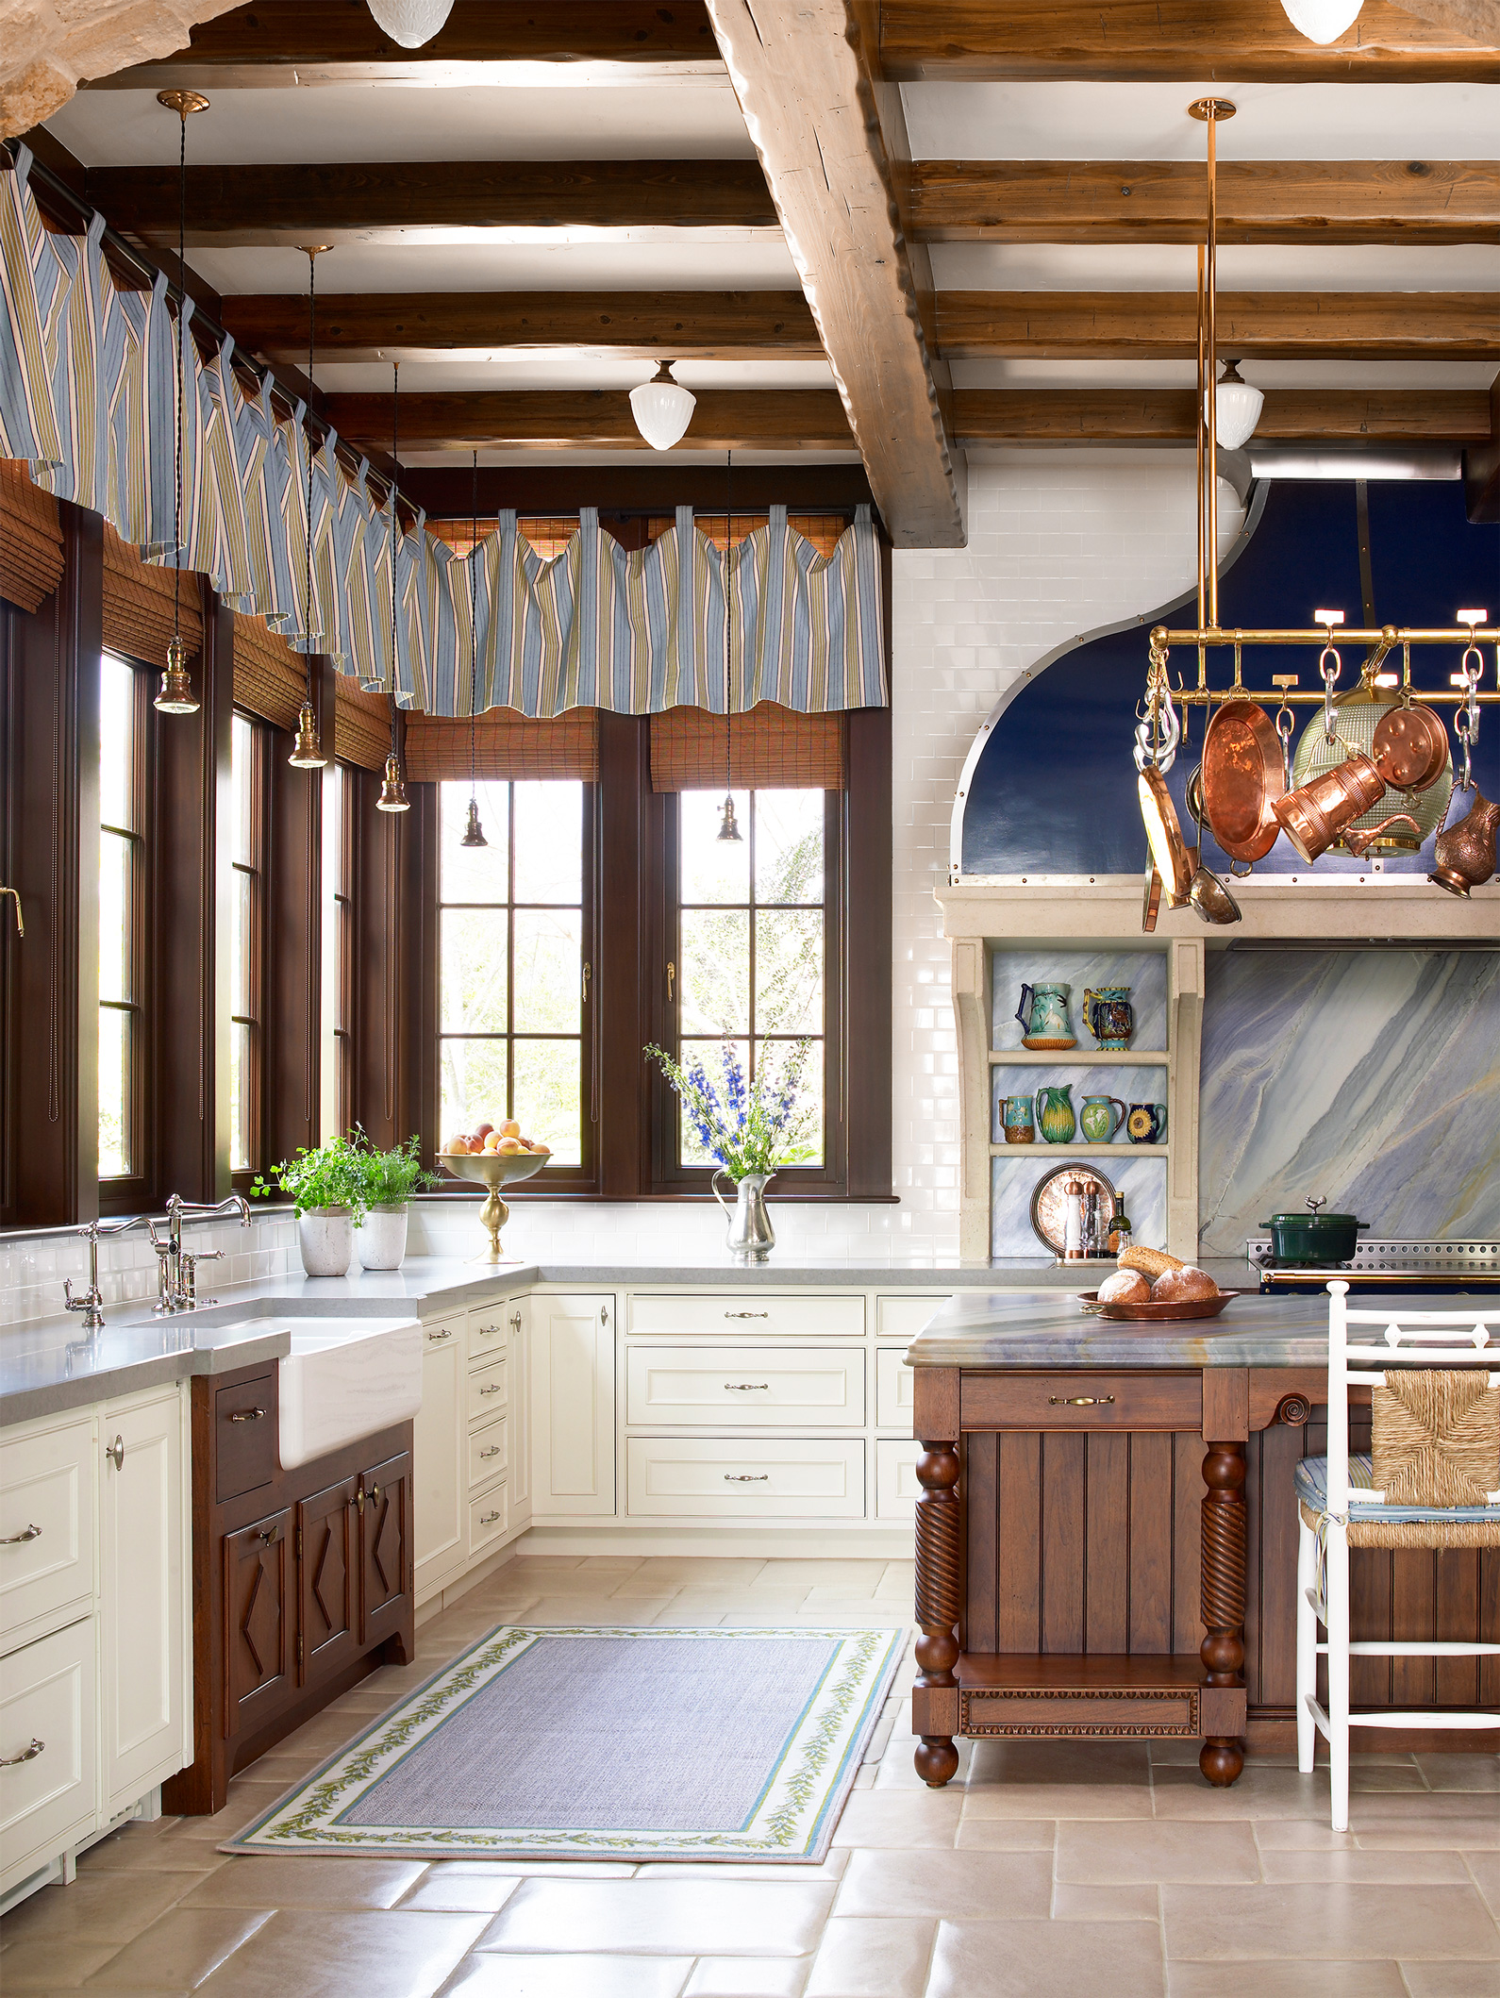 Rustic Window Treatment Ideas   Better Homes & Gardens on Farmhouse Curtain Ideas  id=34863